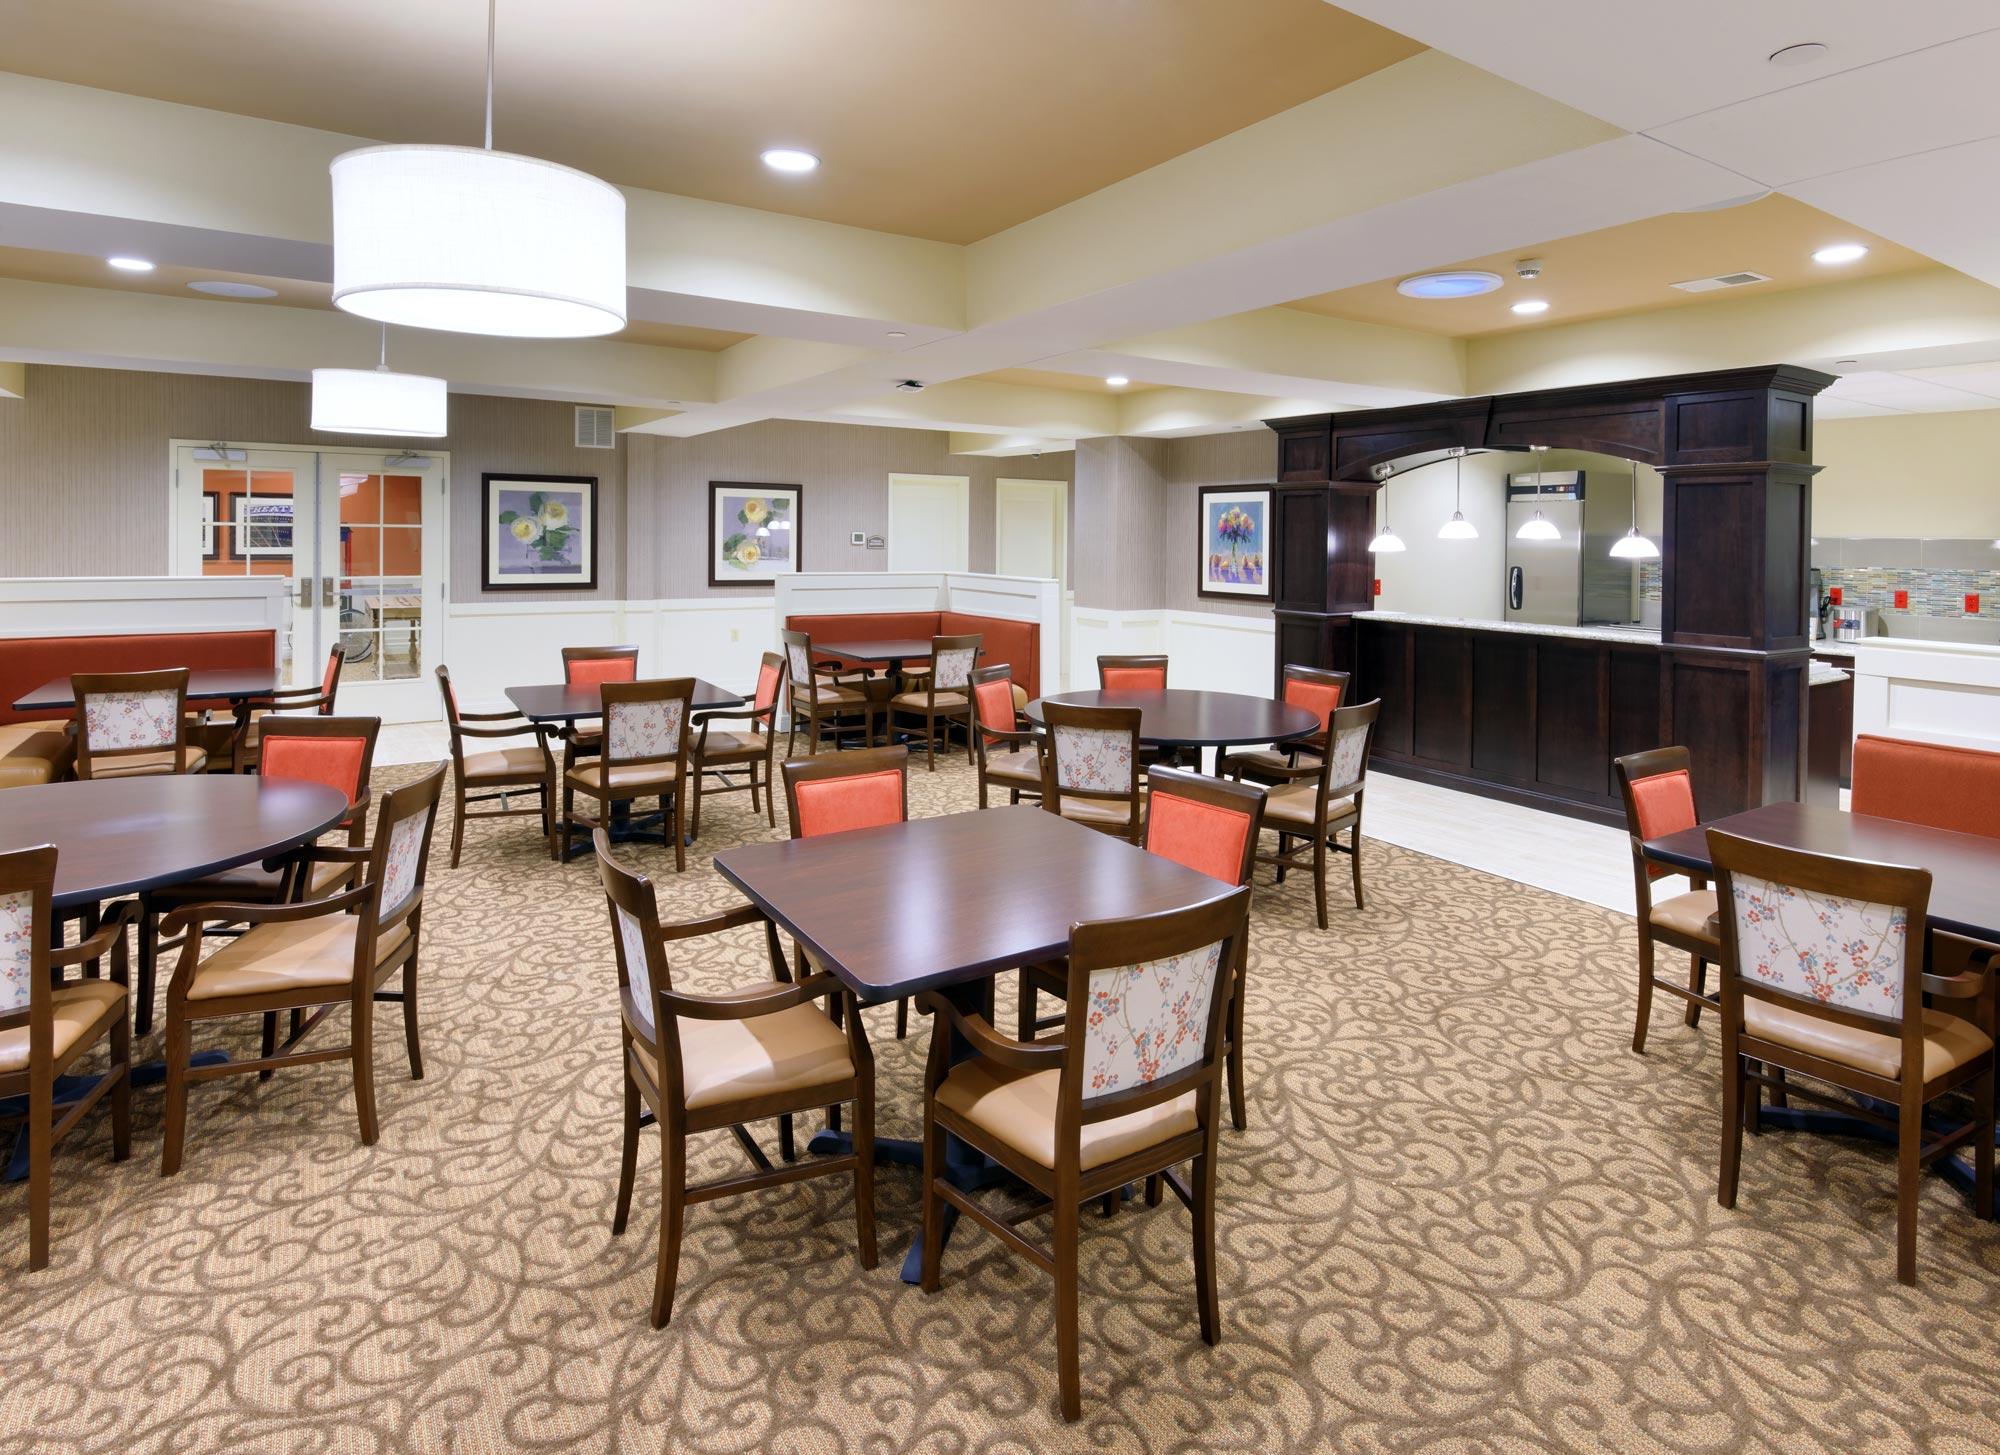 Castlewood-Senior-Living-H-Design-Interior-03.jpg